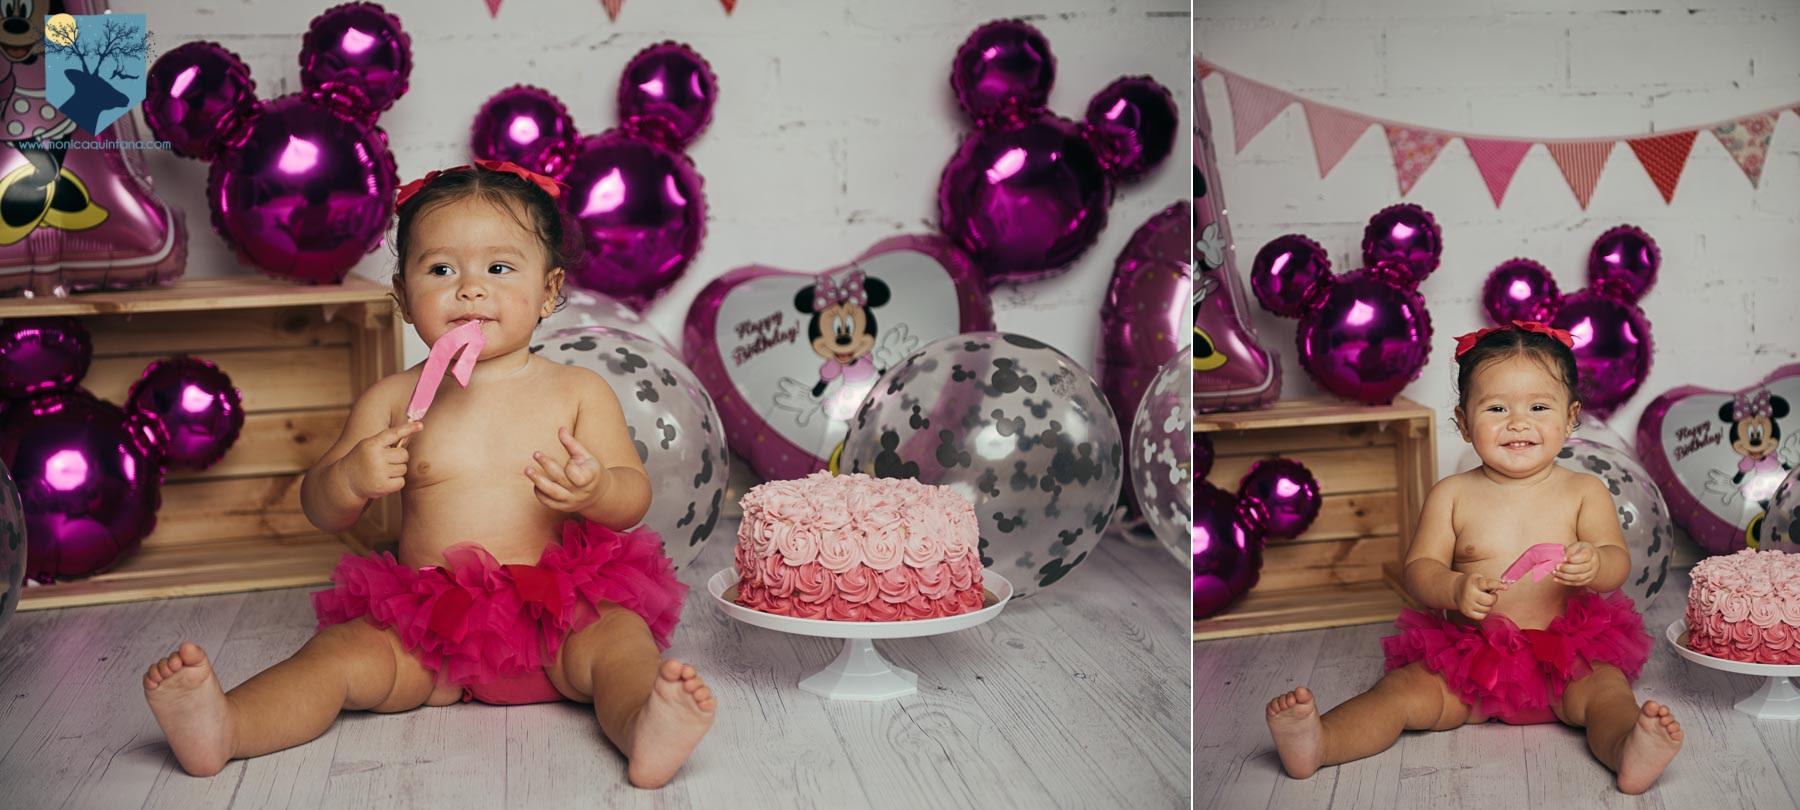 fotografia, fotos, girona, figueres, emporda, monica quintana, bebes, niños, familia, retrato, cumpleaños, un año, smash the cake